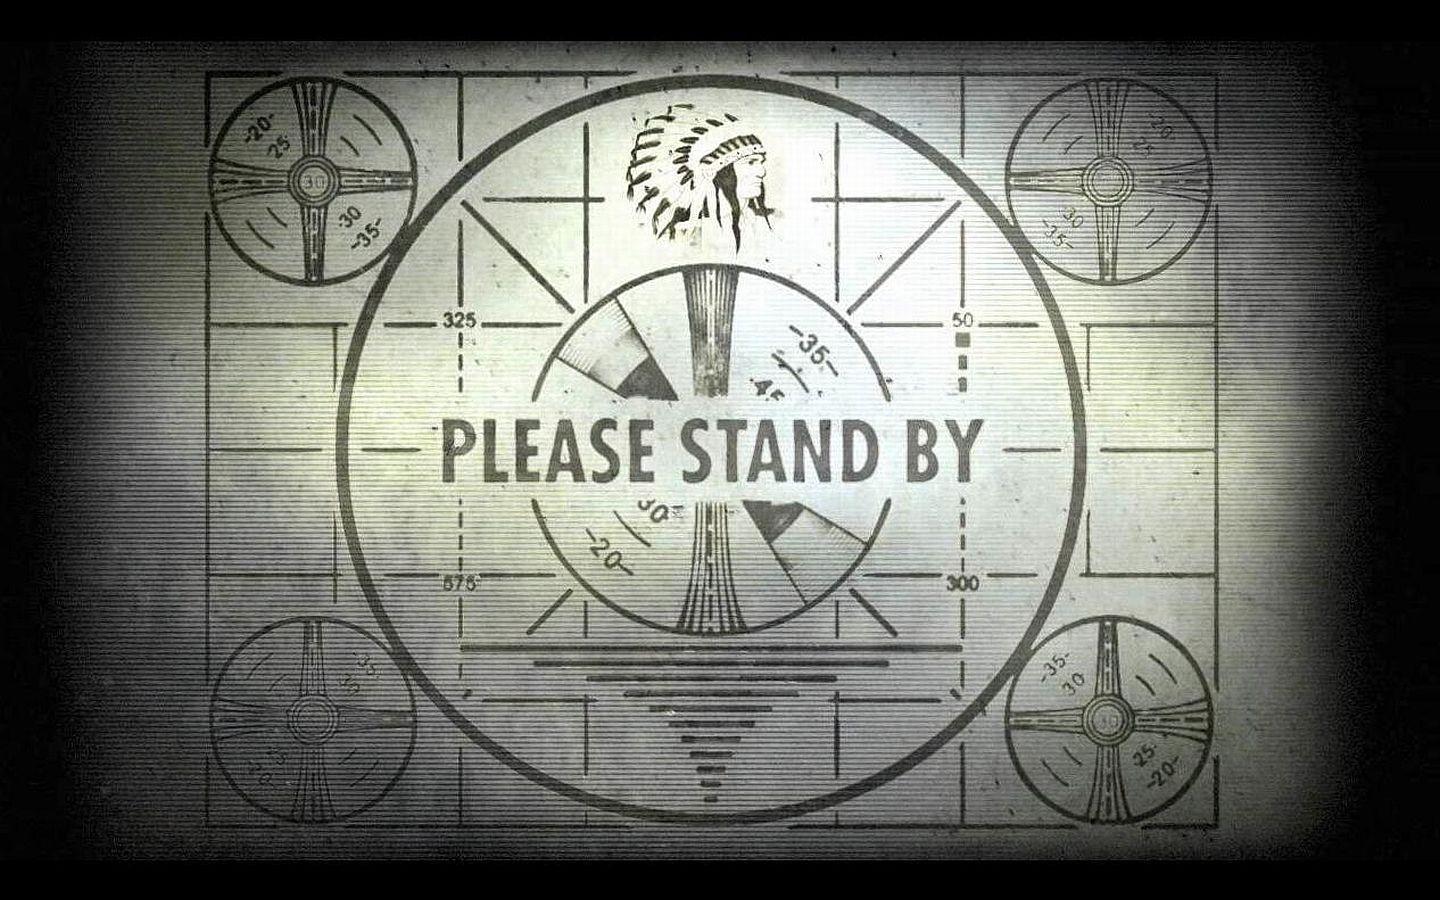 Propaganda Fallout Wallpaper Widescreen Fallout Wallpaper Fallout 3 Fallout Game